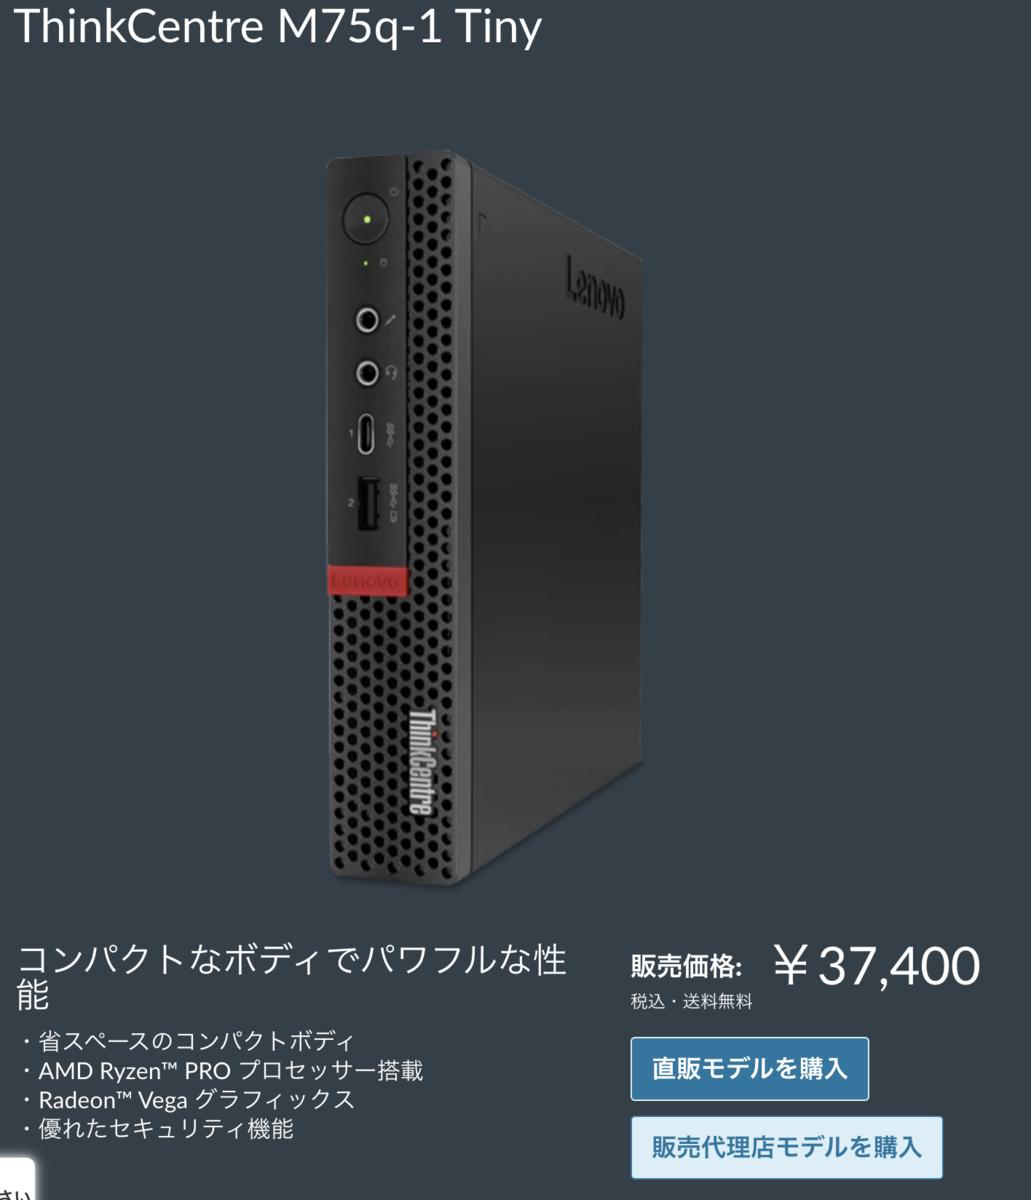 f:id:hardshopper:20200119052013p:plain